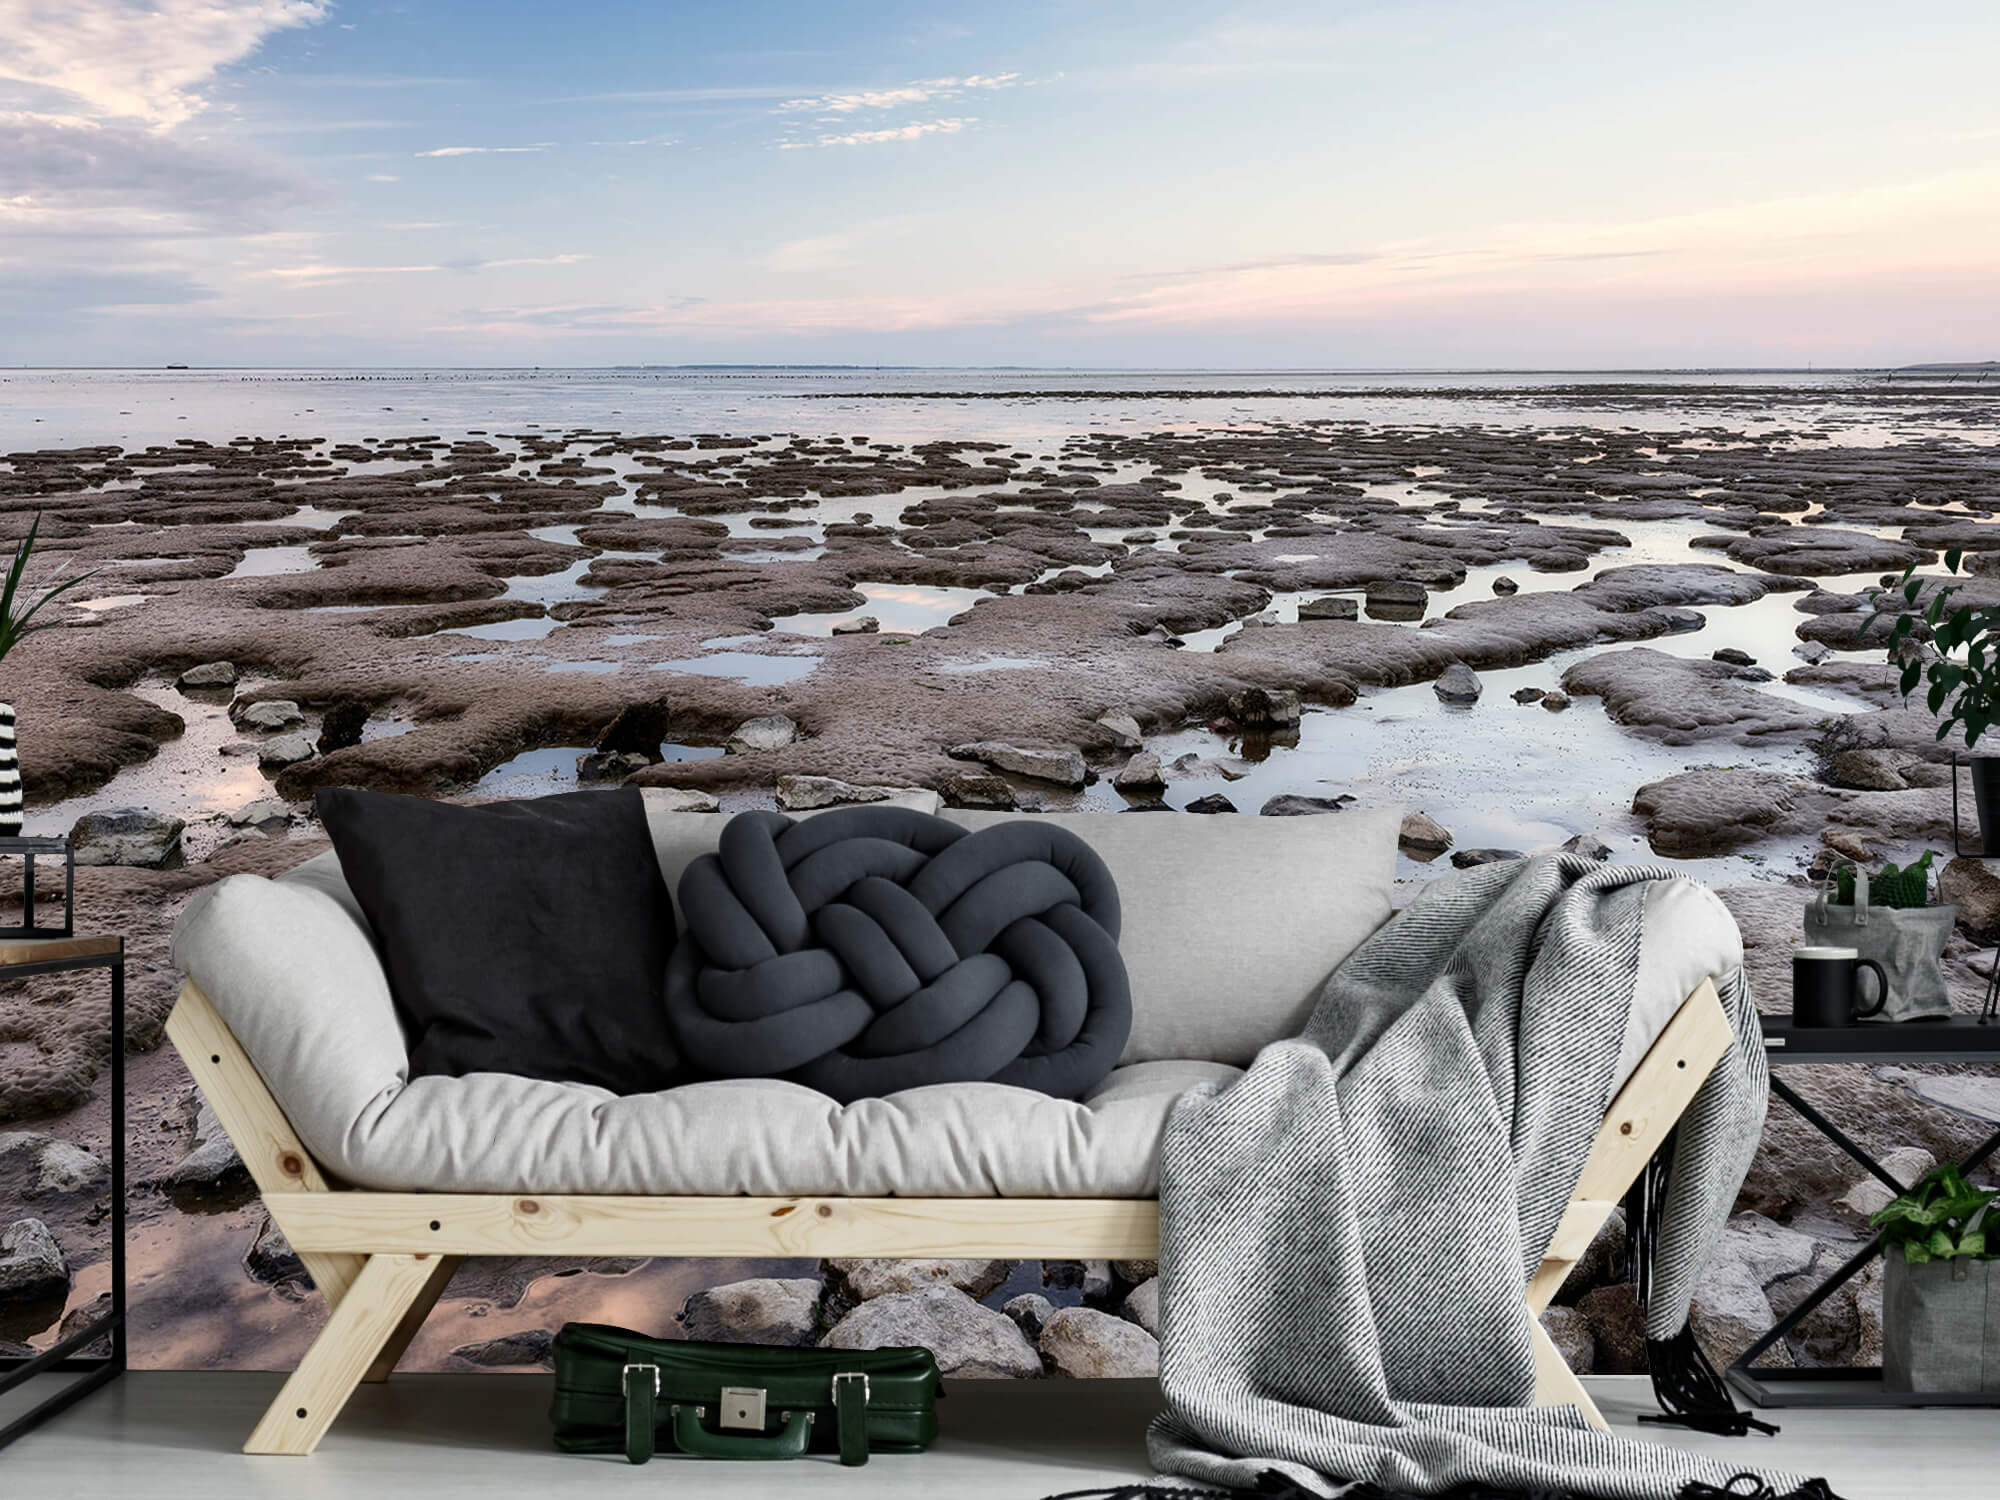 Strand - Stenen langs de kust 7